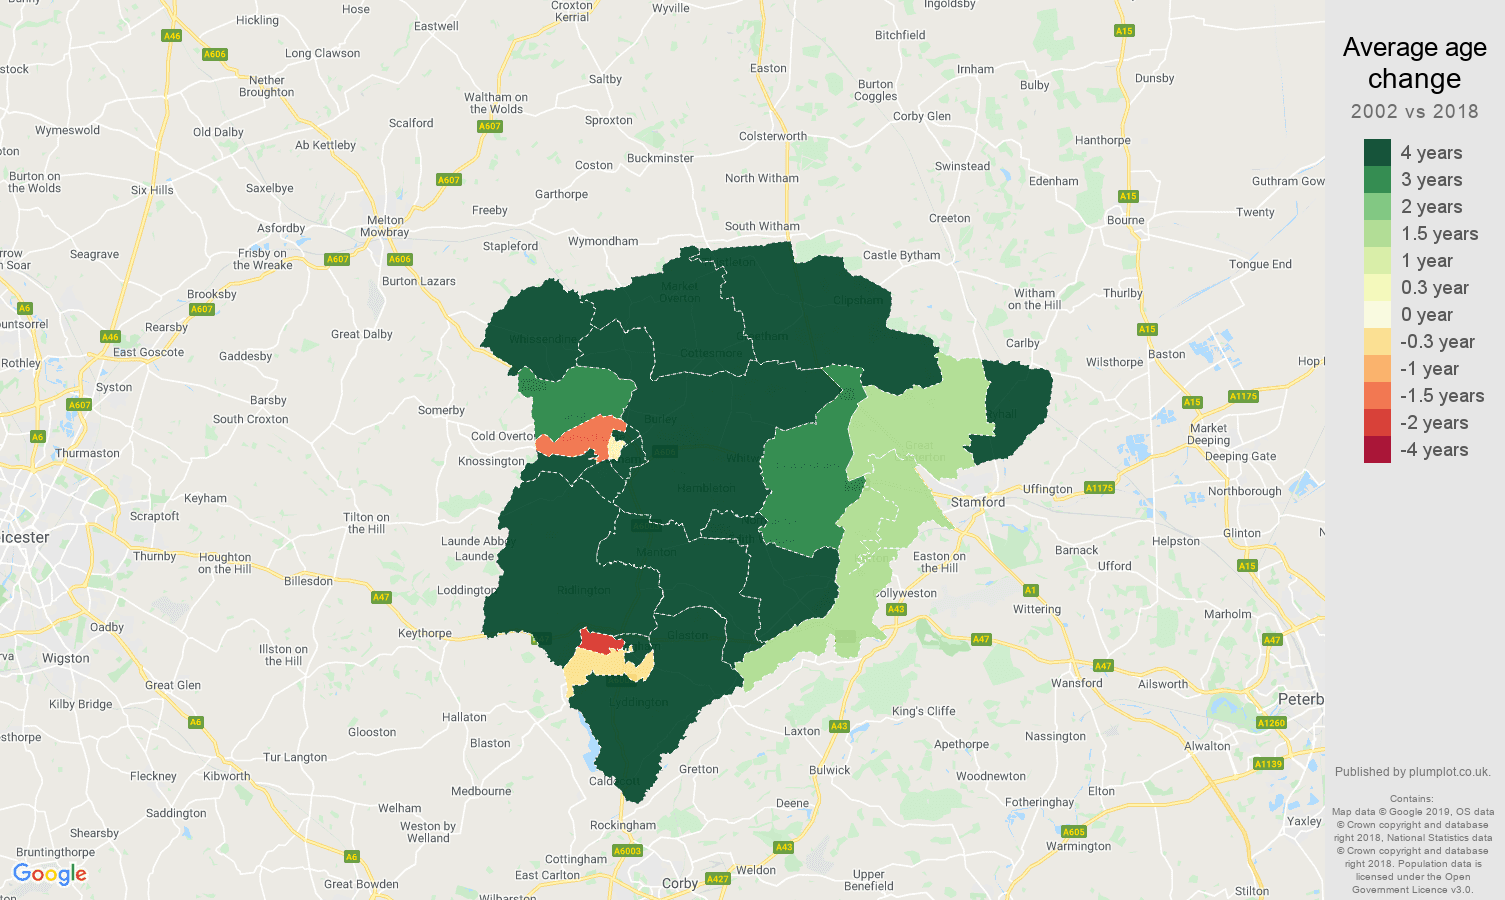 Rutland average age change map